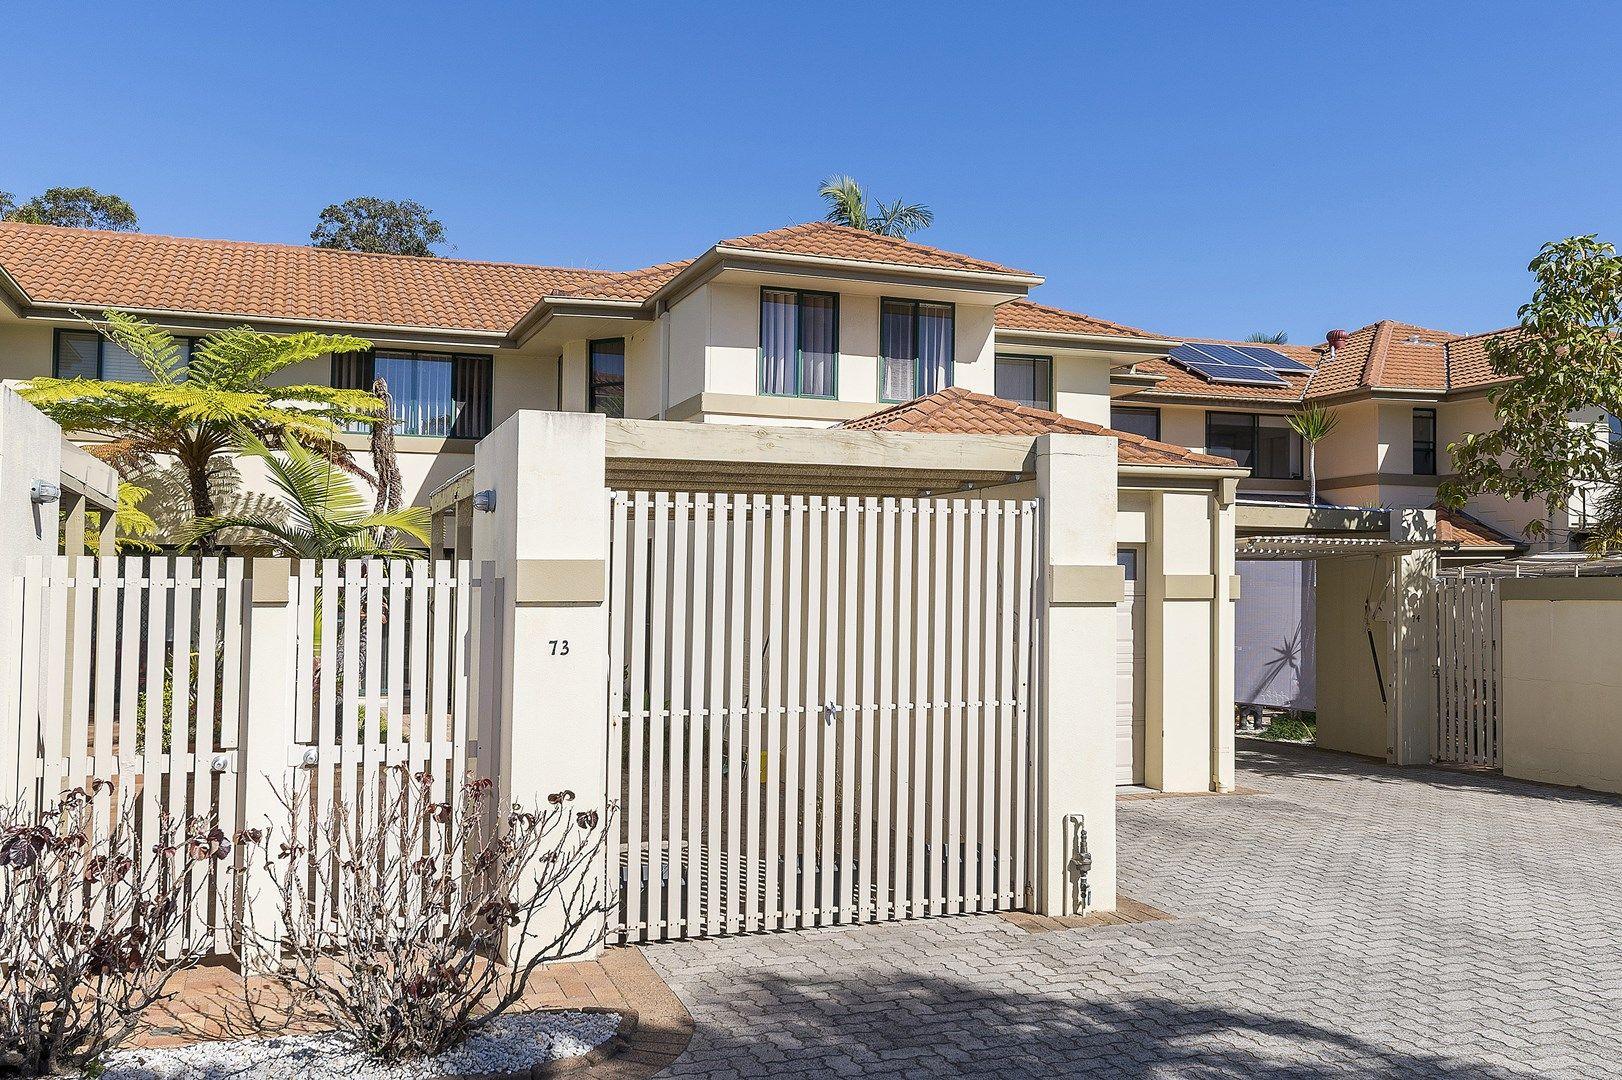 73/100 Morala Avenue, Runaway Bay QLD 4216, Image 0